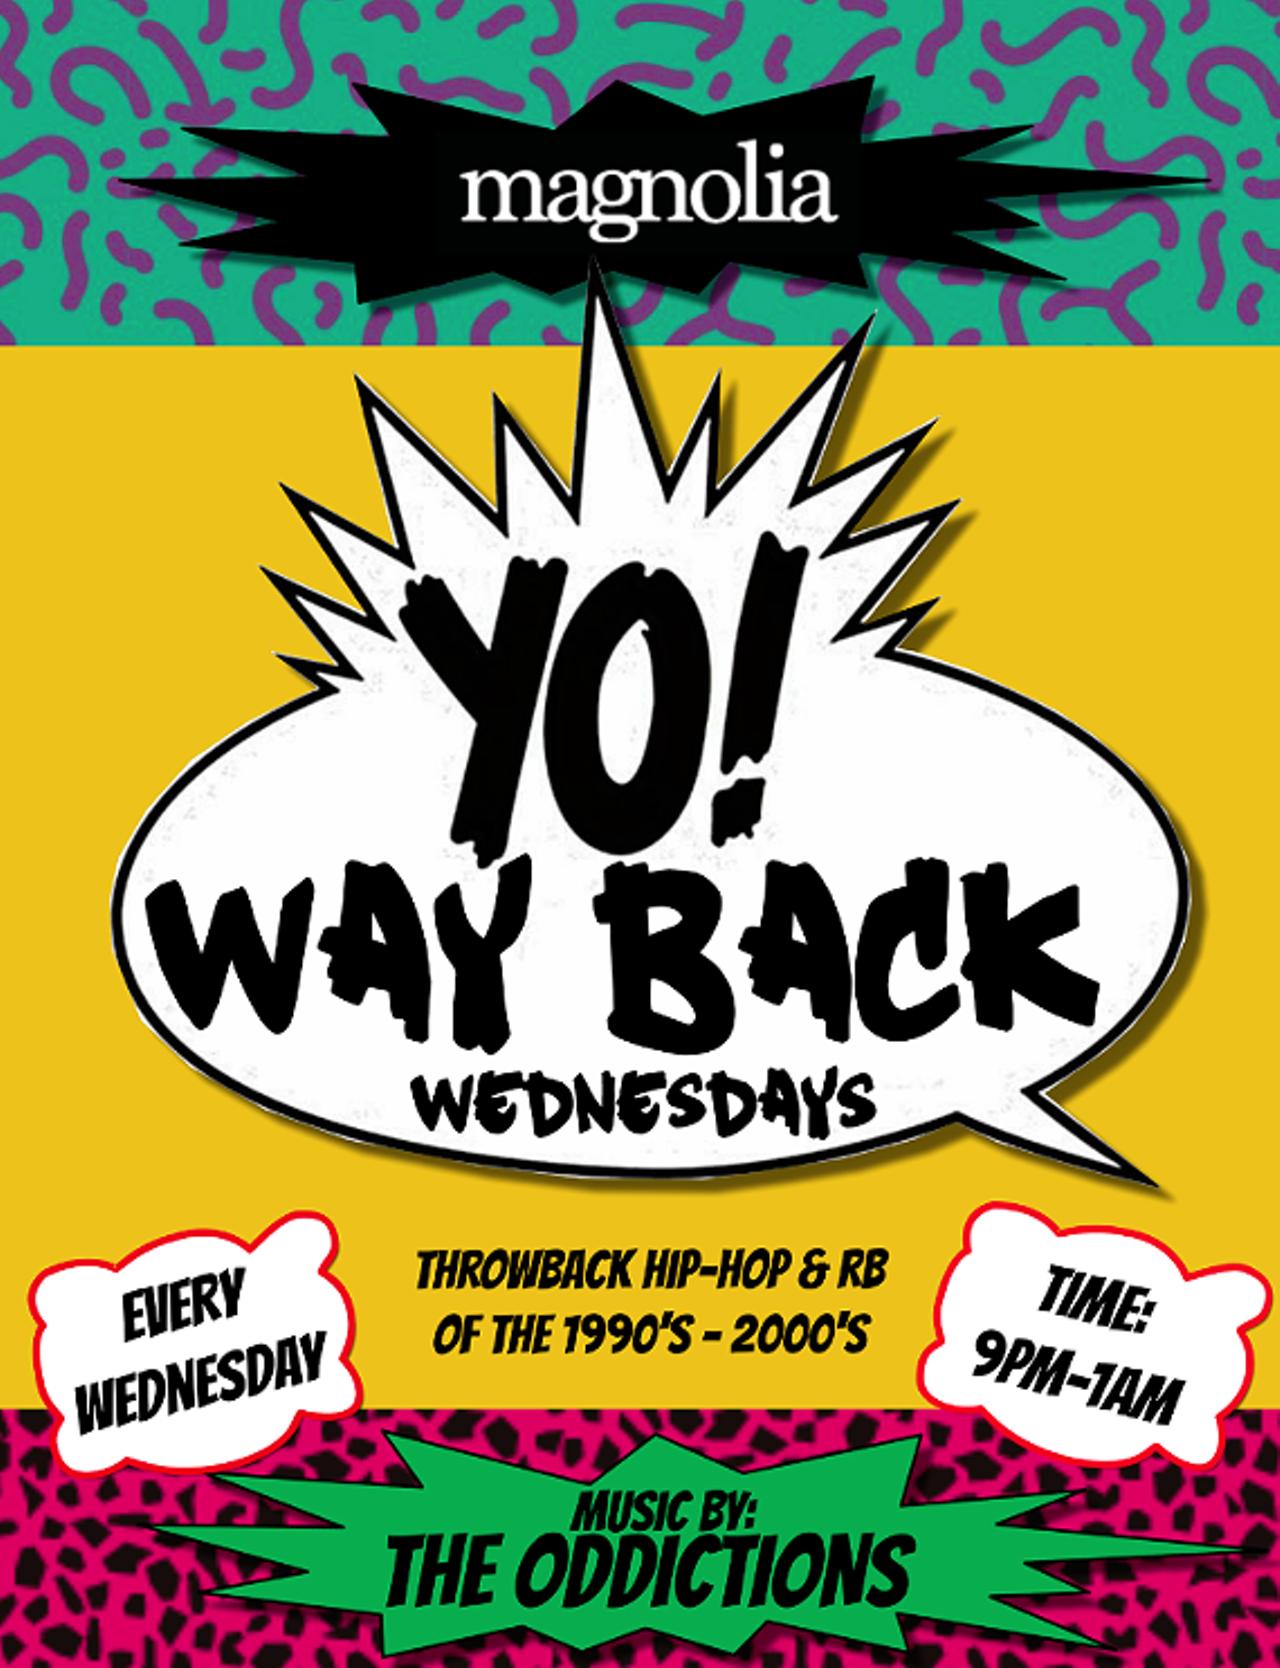 2000s hip hop flyer clipart transparent stock Way Back Wednesdays: The Oddictions | Magnolia | Clubs/Lounges ... transparent stock